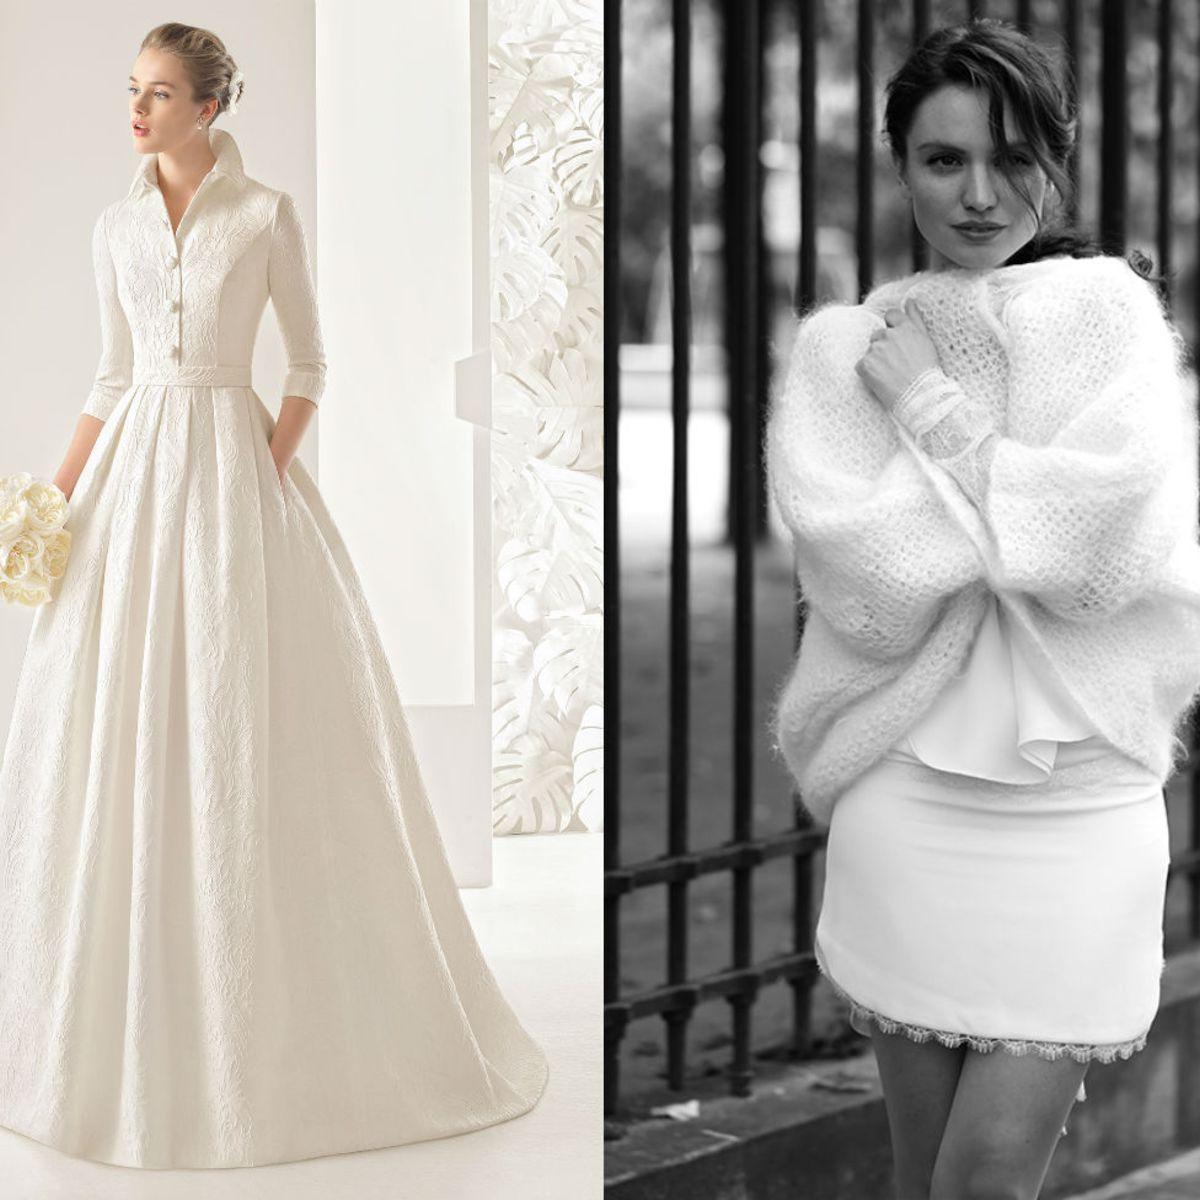 Robe mariee hiver